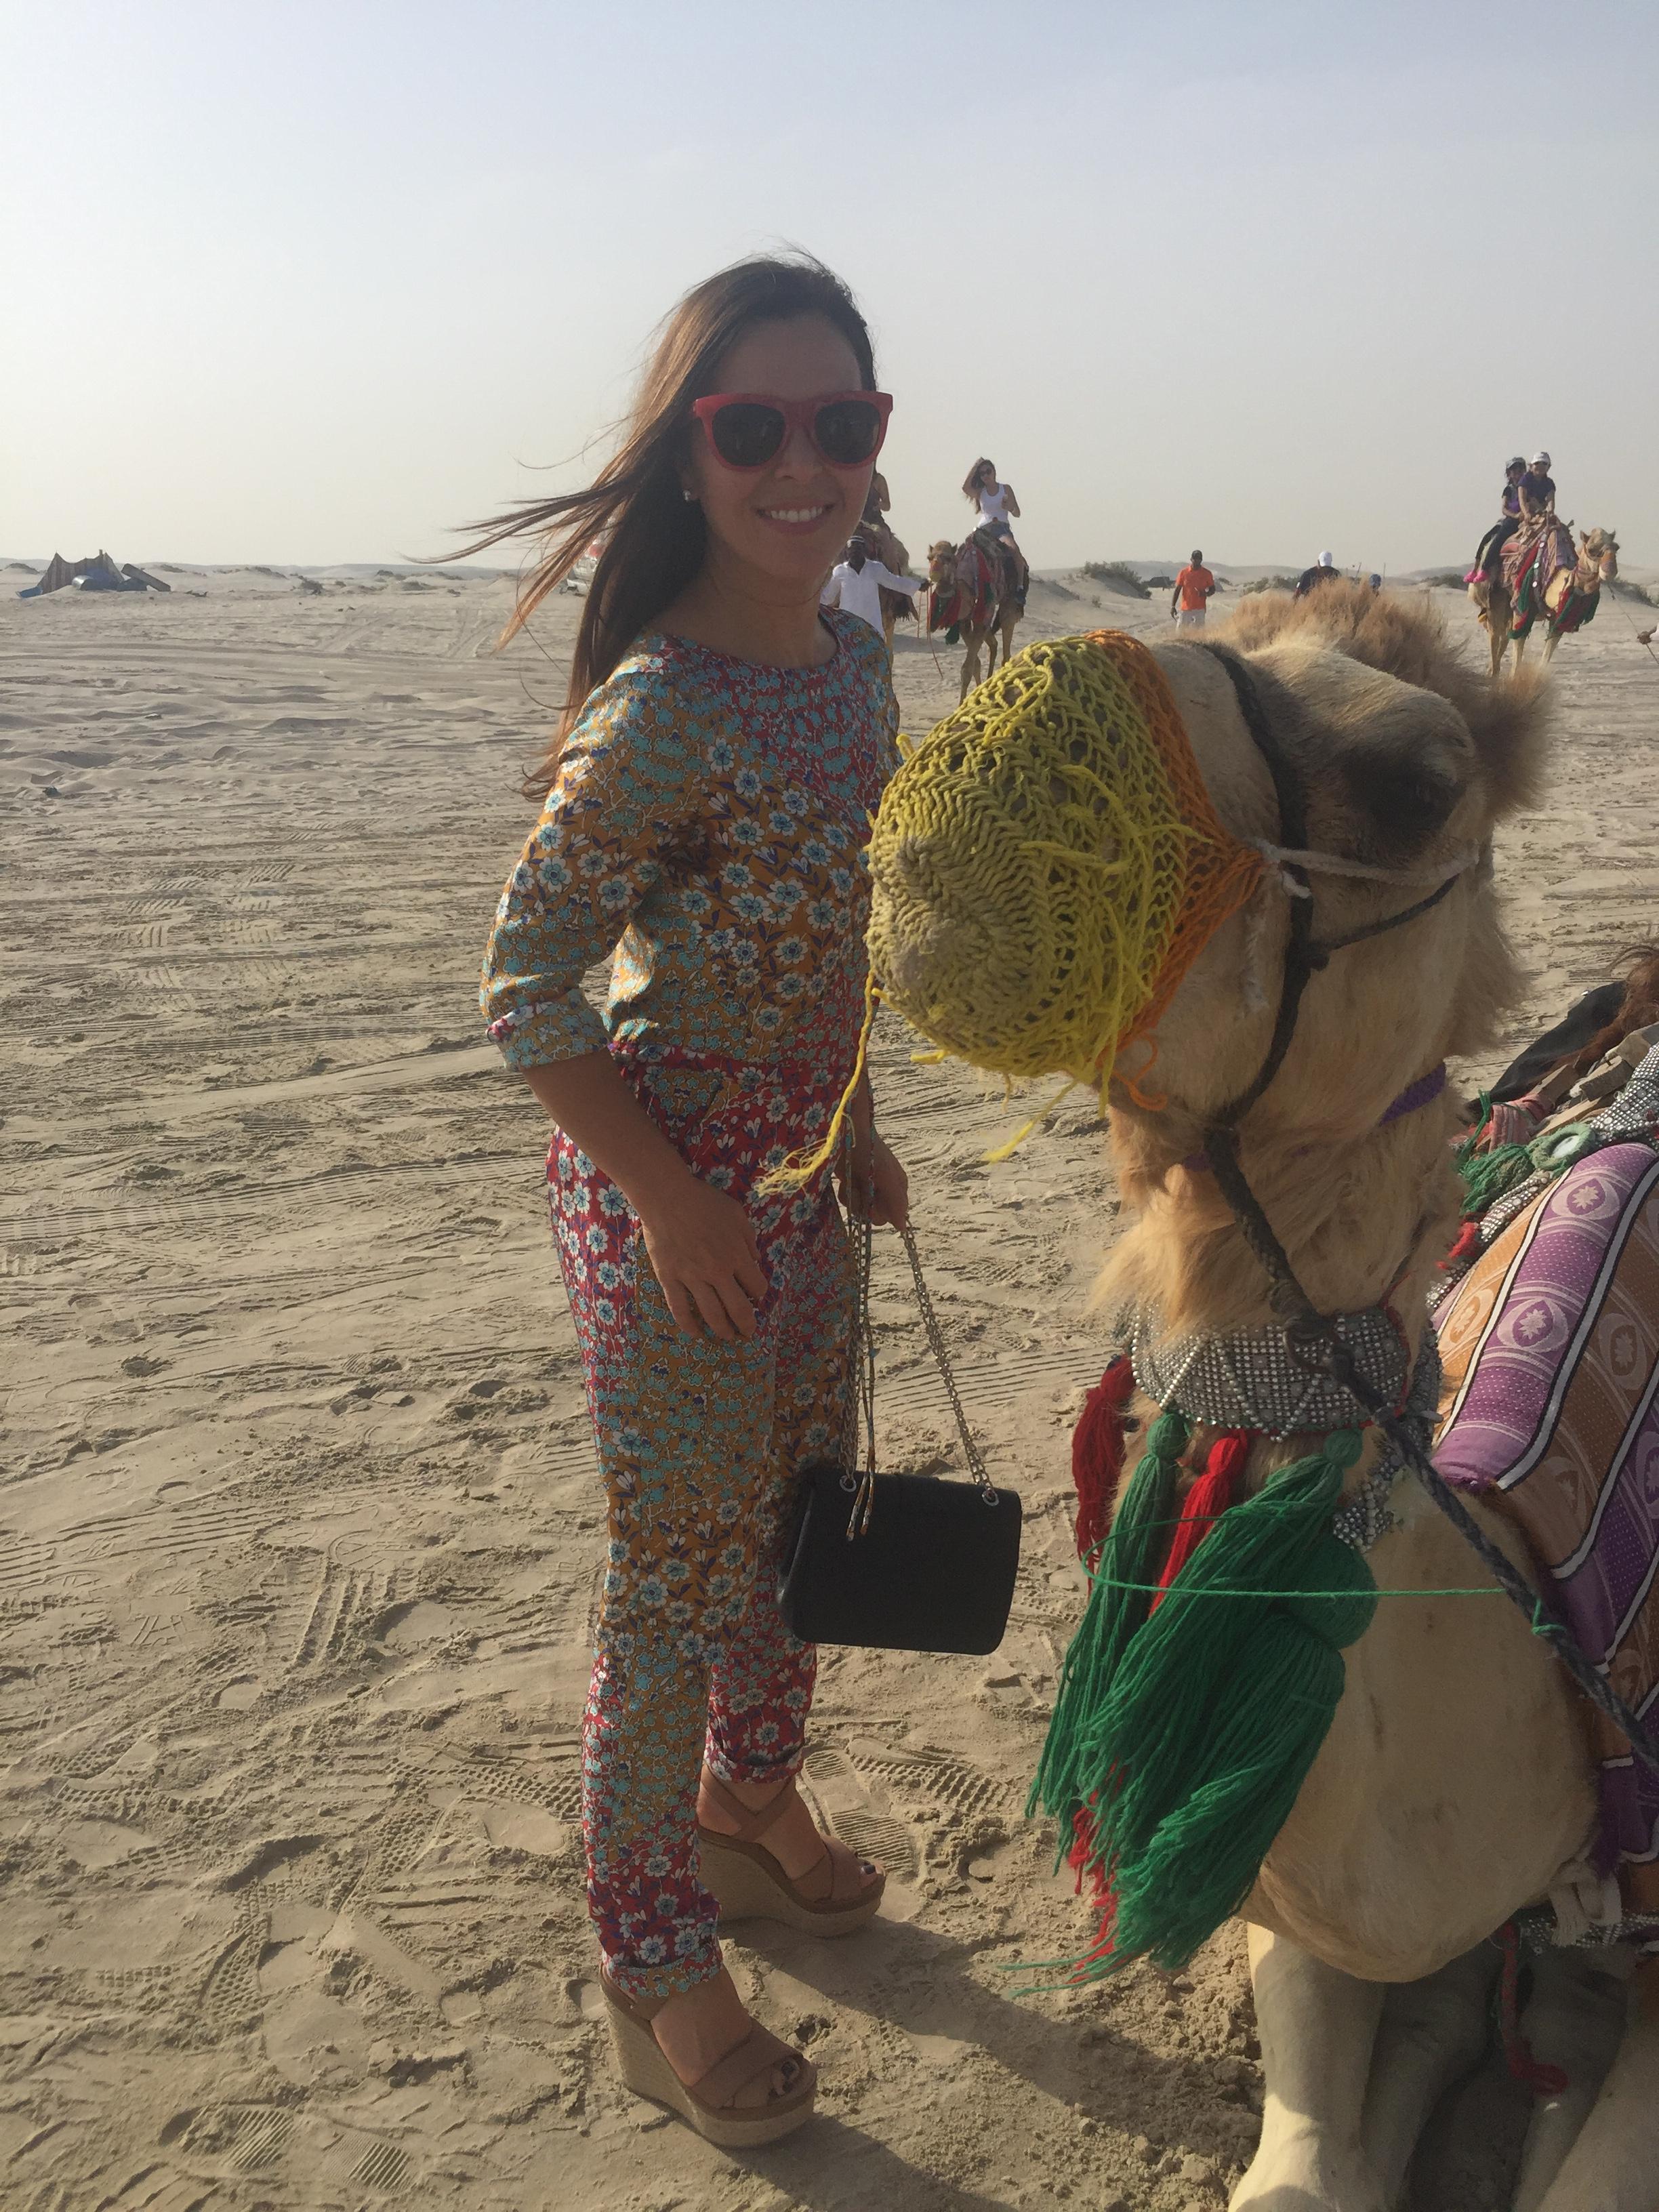 Monique Lhuillier travel diary: Made a friend!